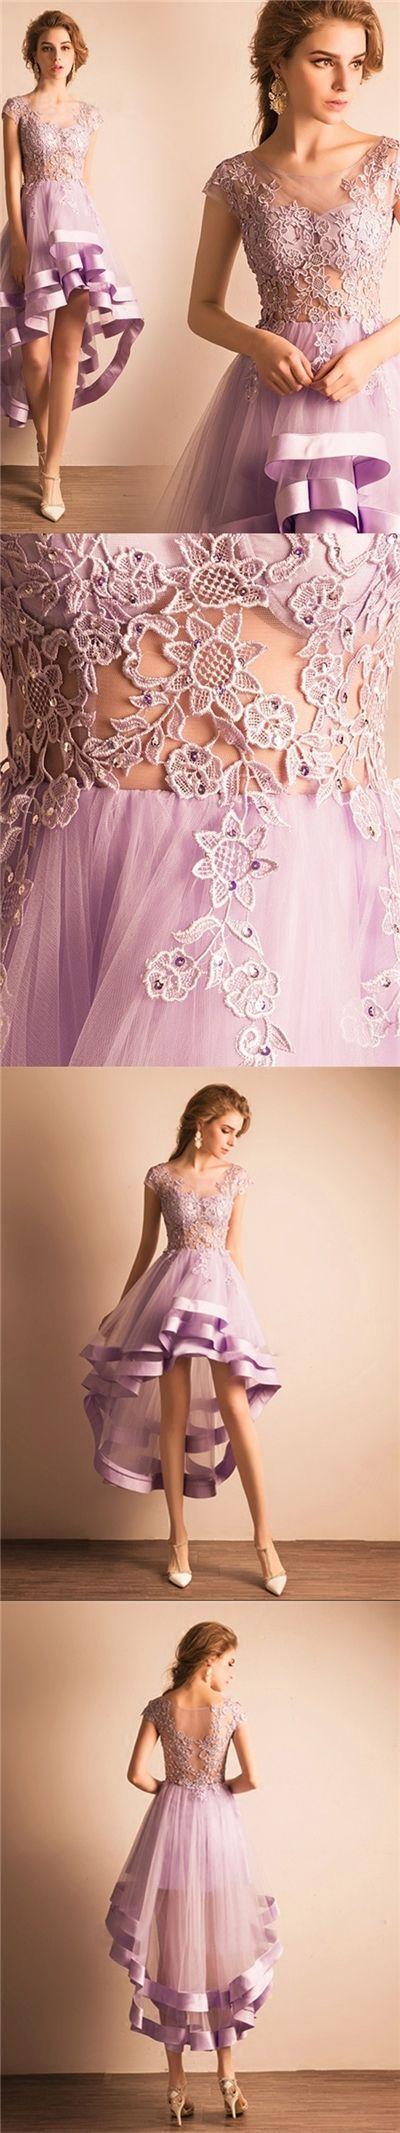 Cute Homecoming Dress Lilac Tulle Asymmetrical Short Prom Dress Party Dress JK302